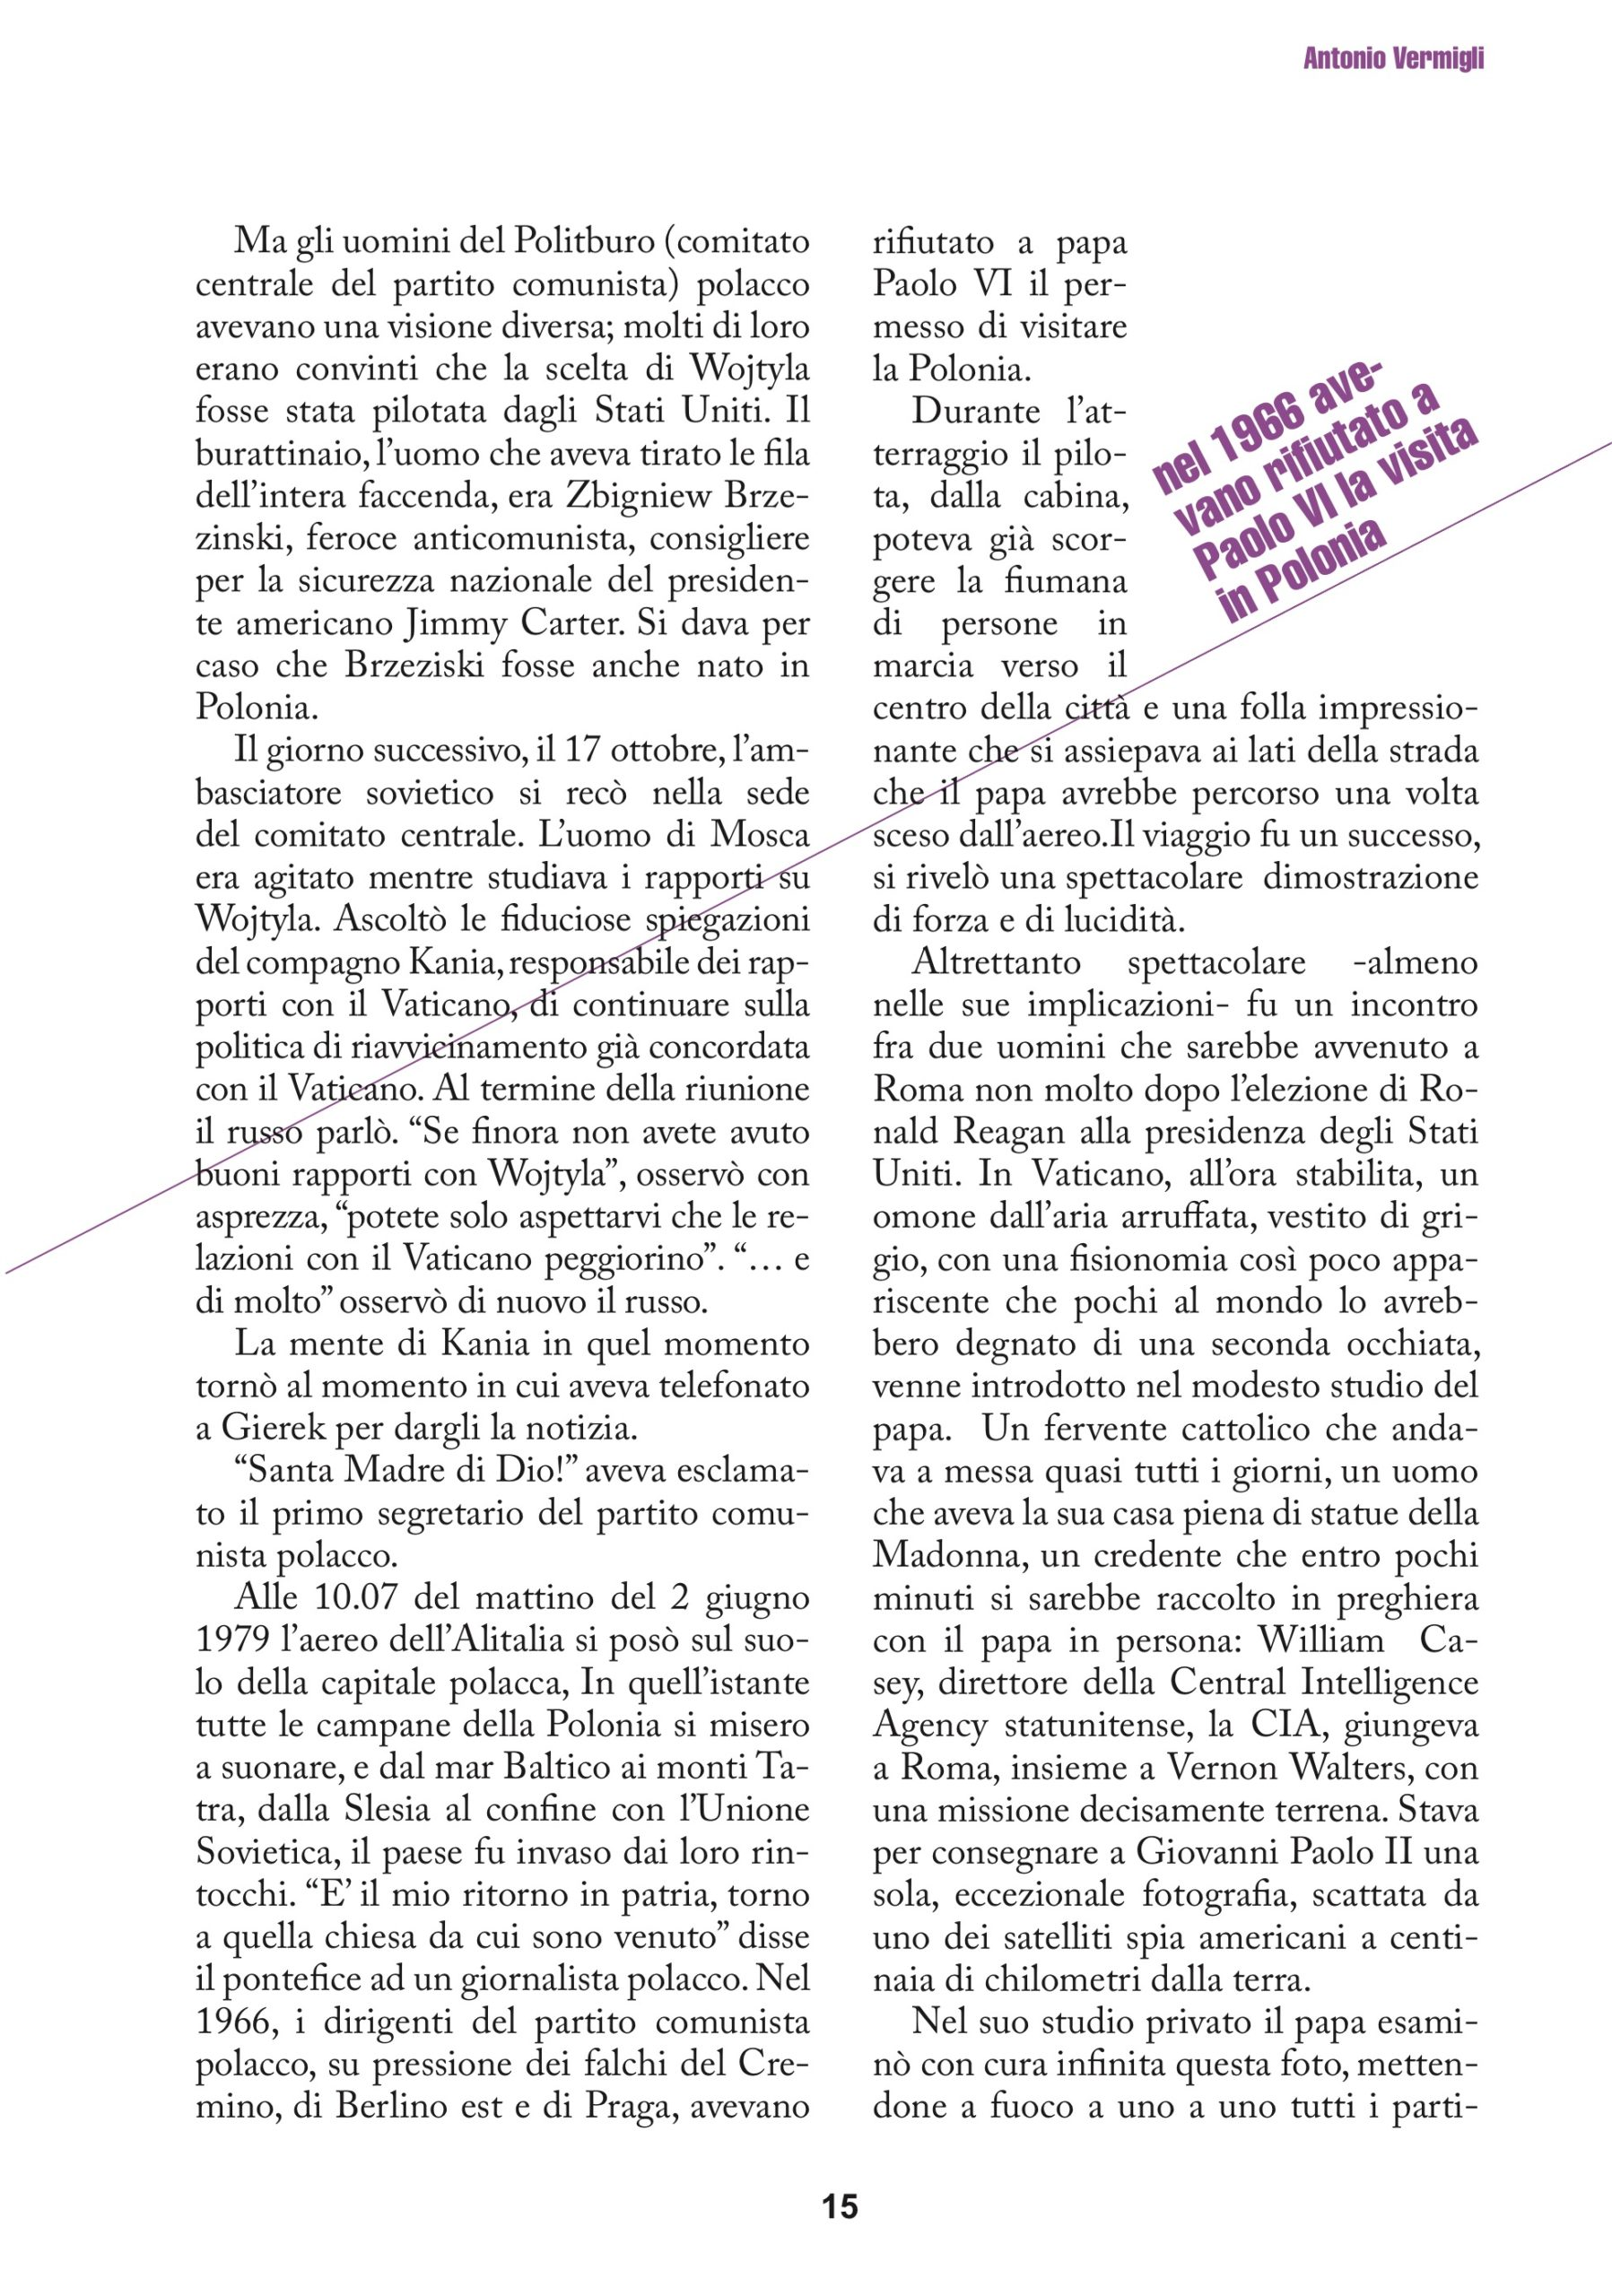 Vermigli GPII páginas 13 - 22-3